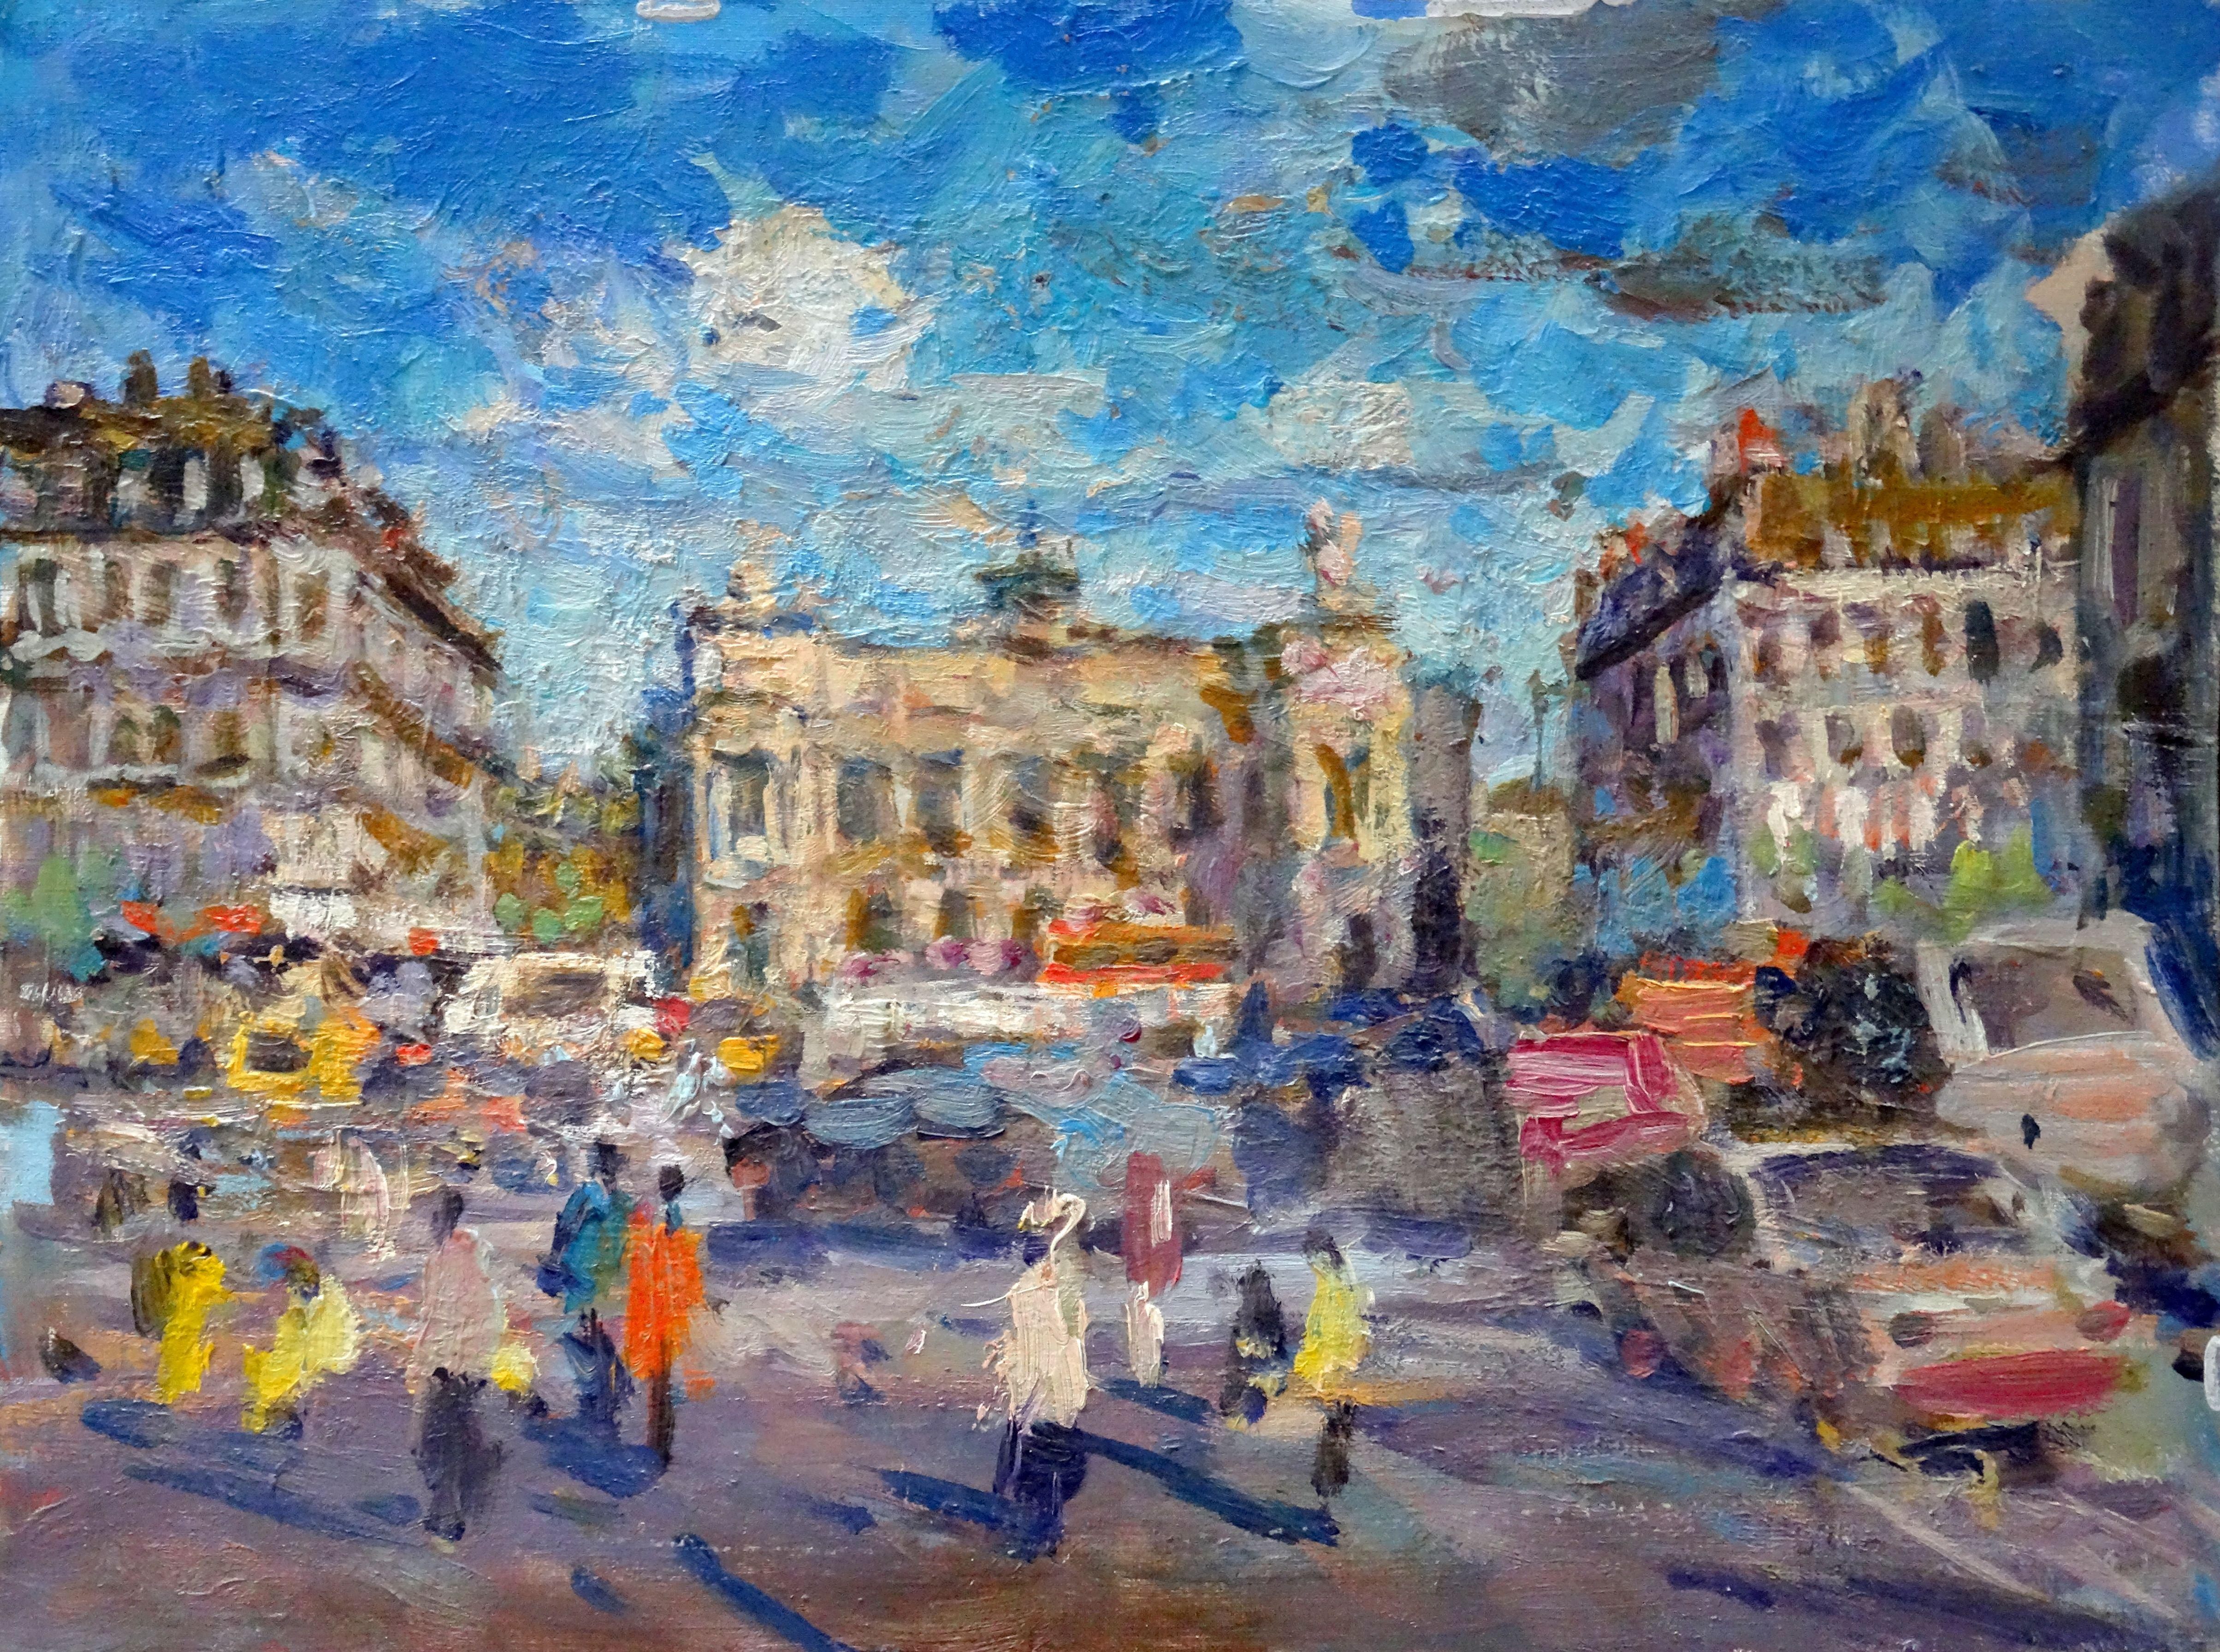 Paris. 2009, canvas on cardboard, oil, 30x40 cm